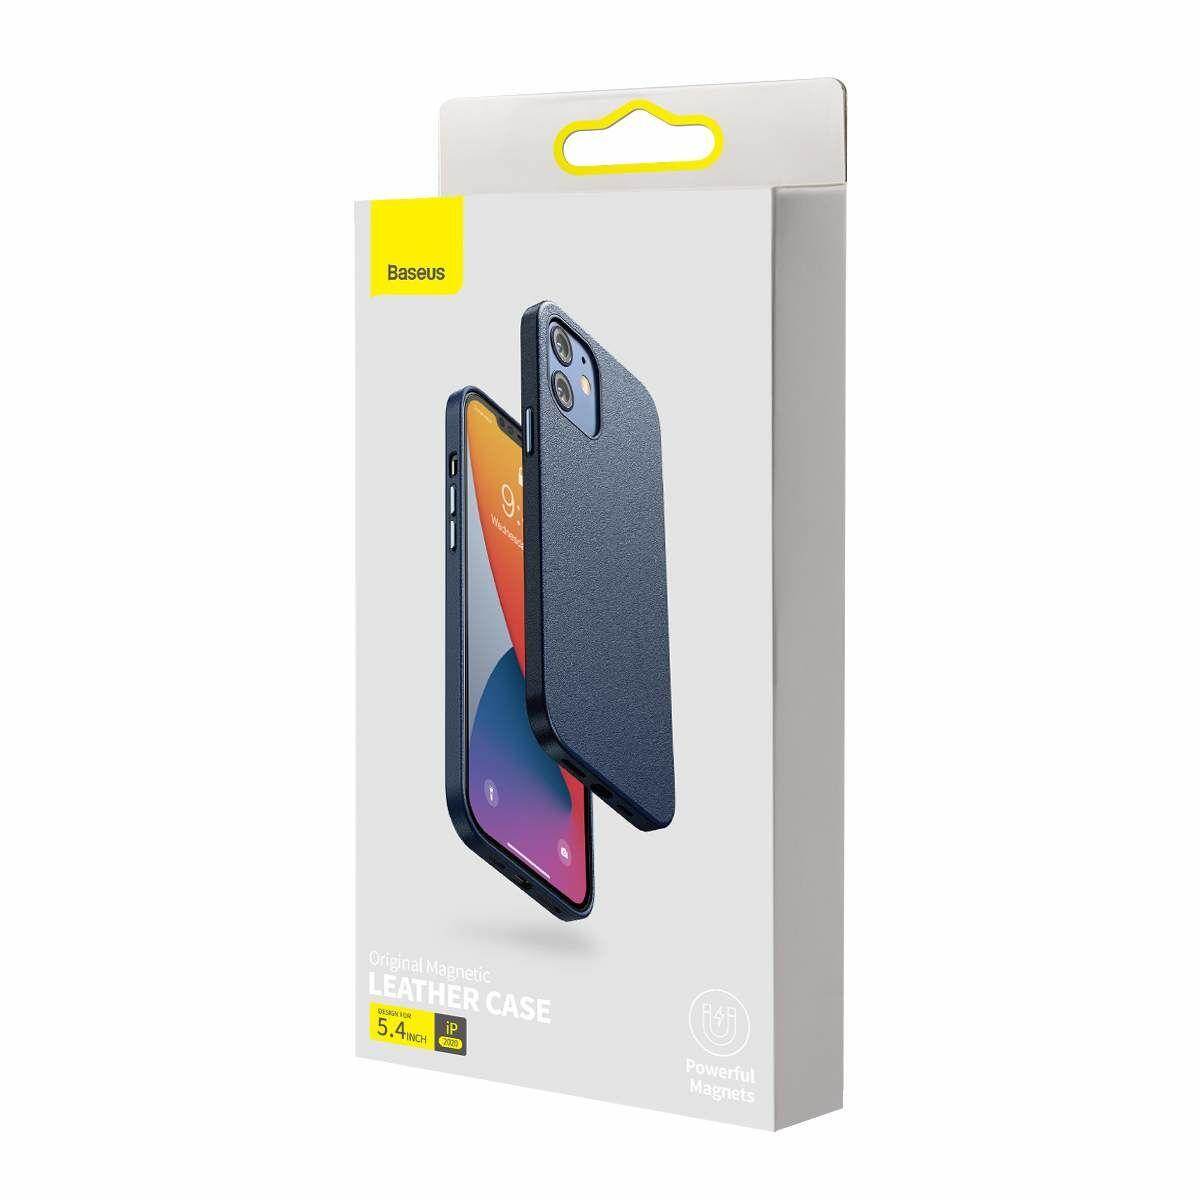 Baseus iPhone 12 mini tok, Original Magnetic, kék (LTAPIPH54N-YP03)